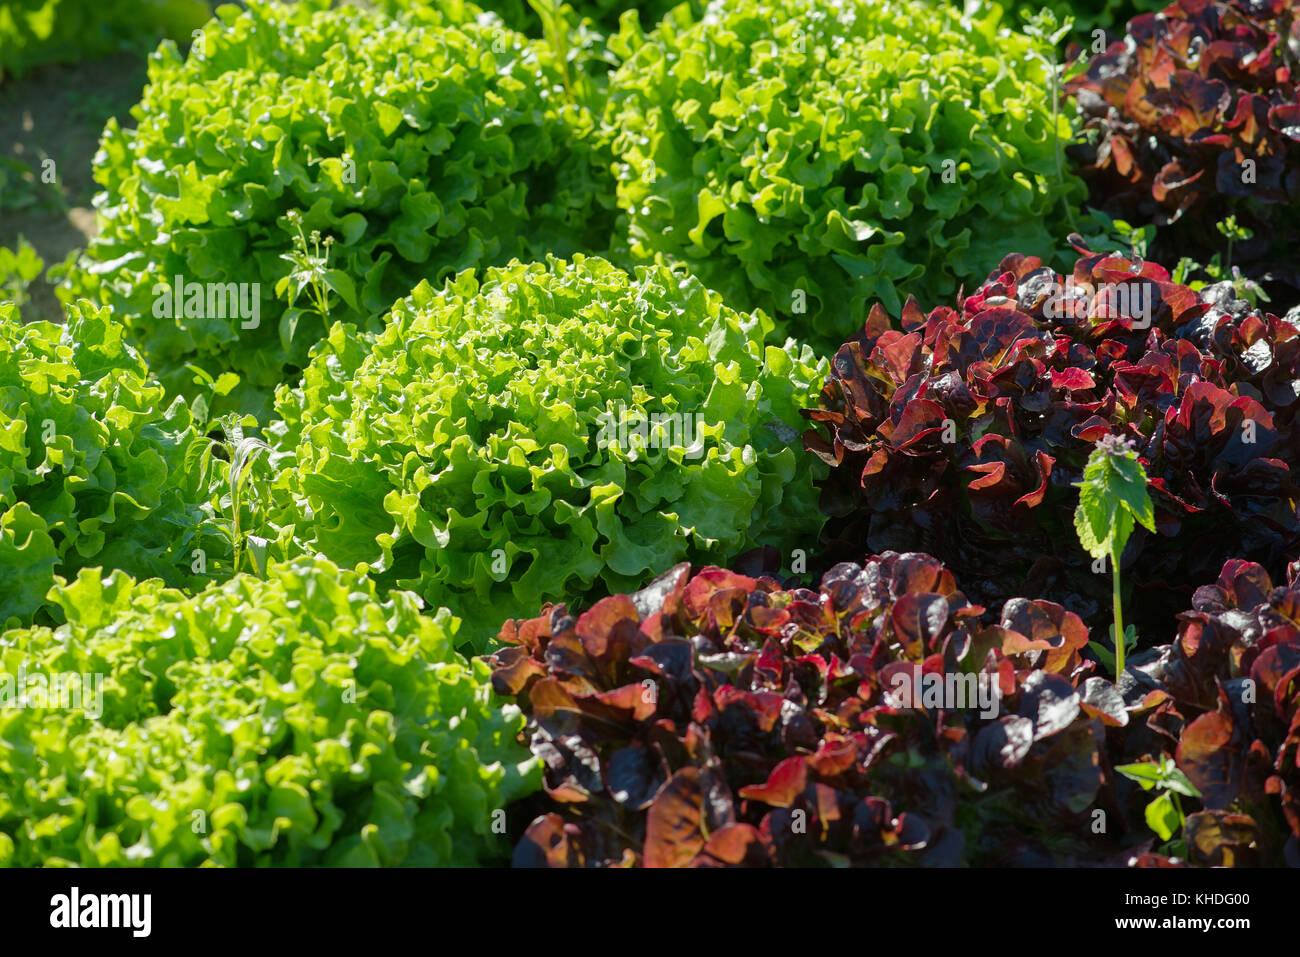 Lettuces growing in garden Stock Photo